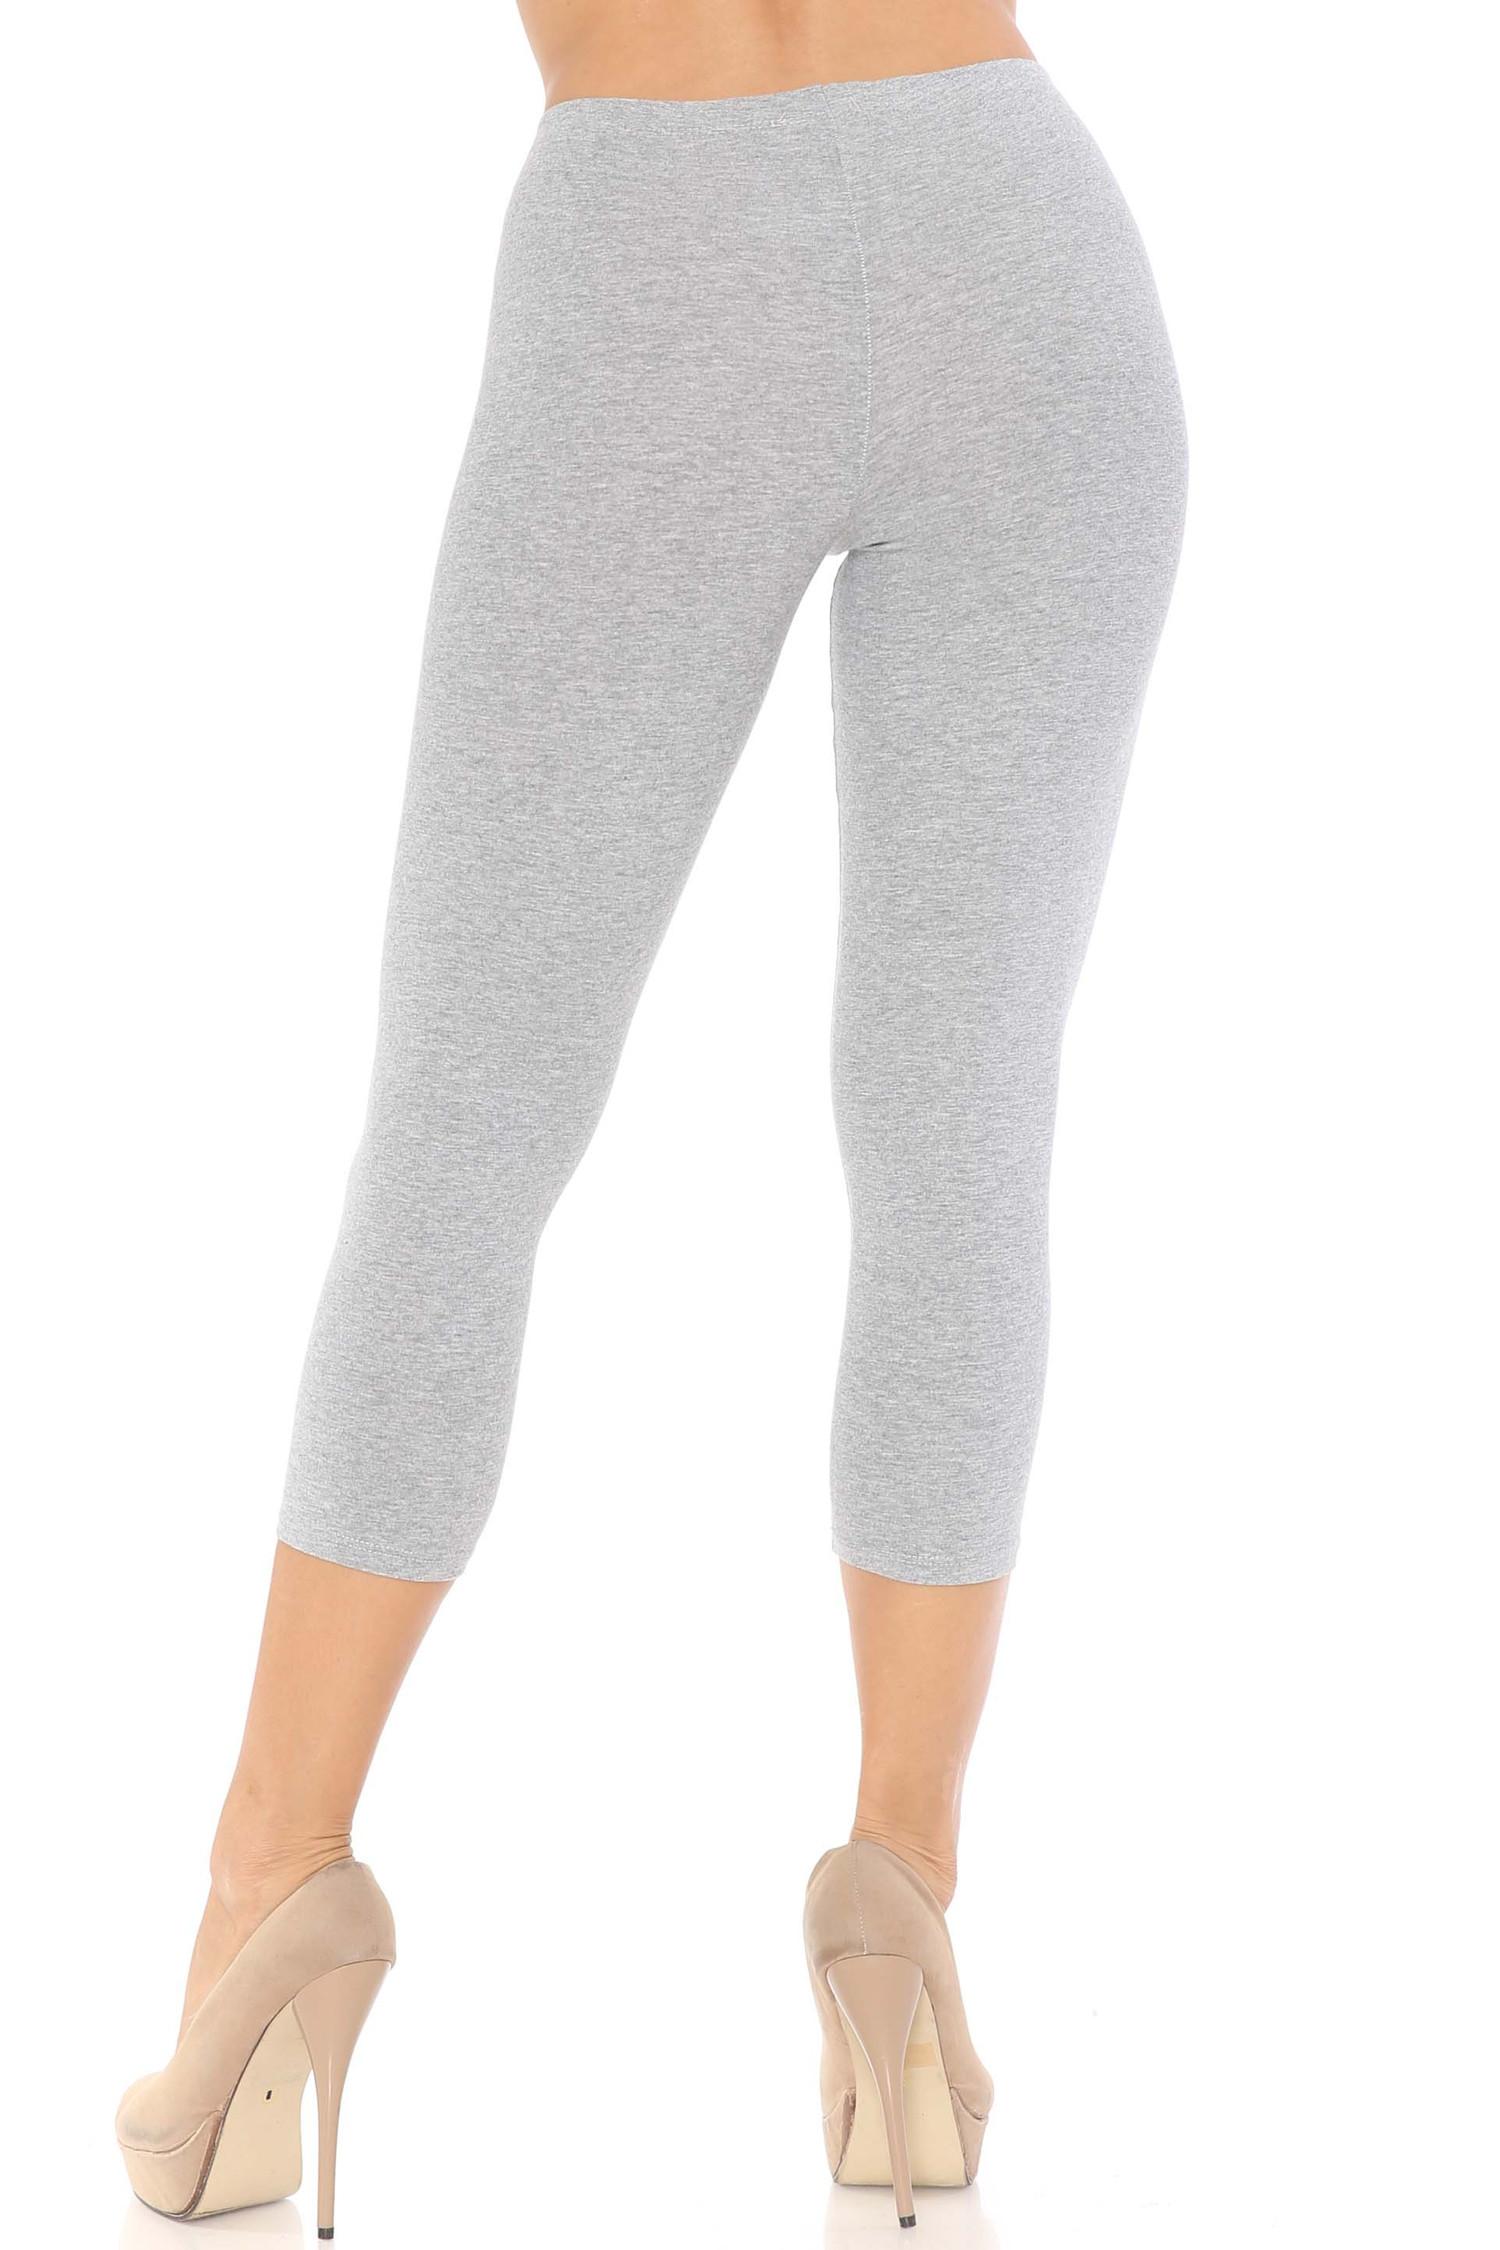 Rear view of heather gray USA Cotton Capri Length Leggings